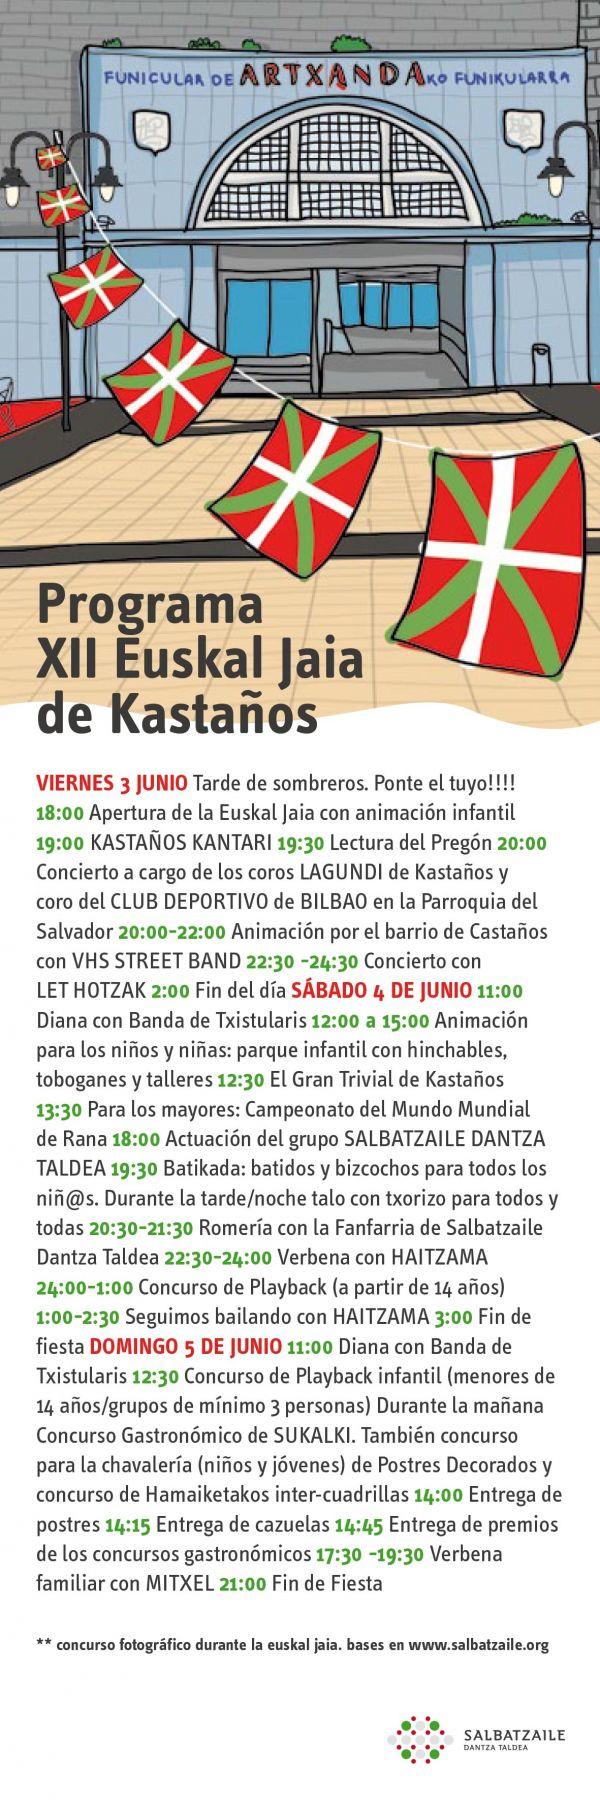 Seguir leyendo:Programa Euskal Jaia 2016